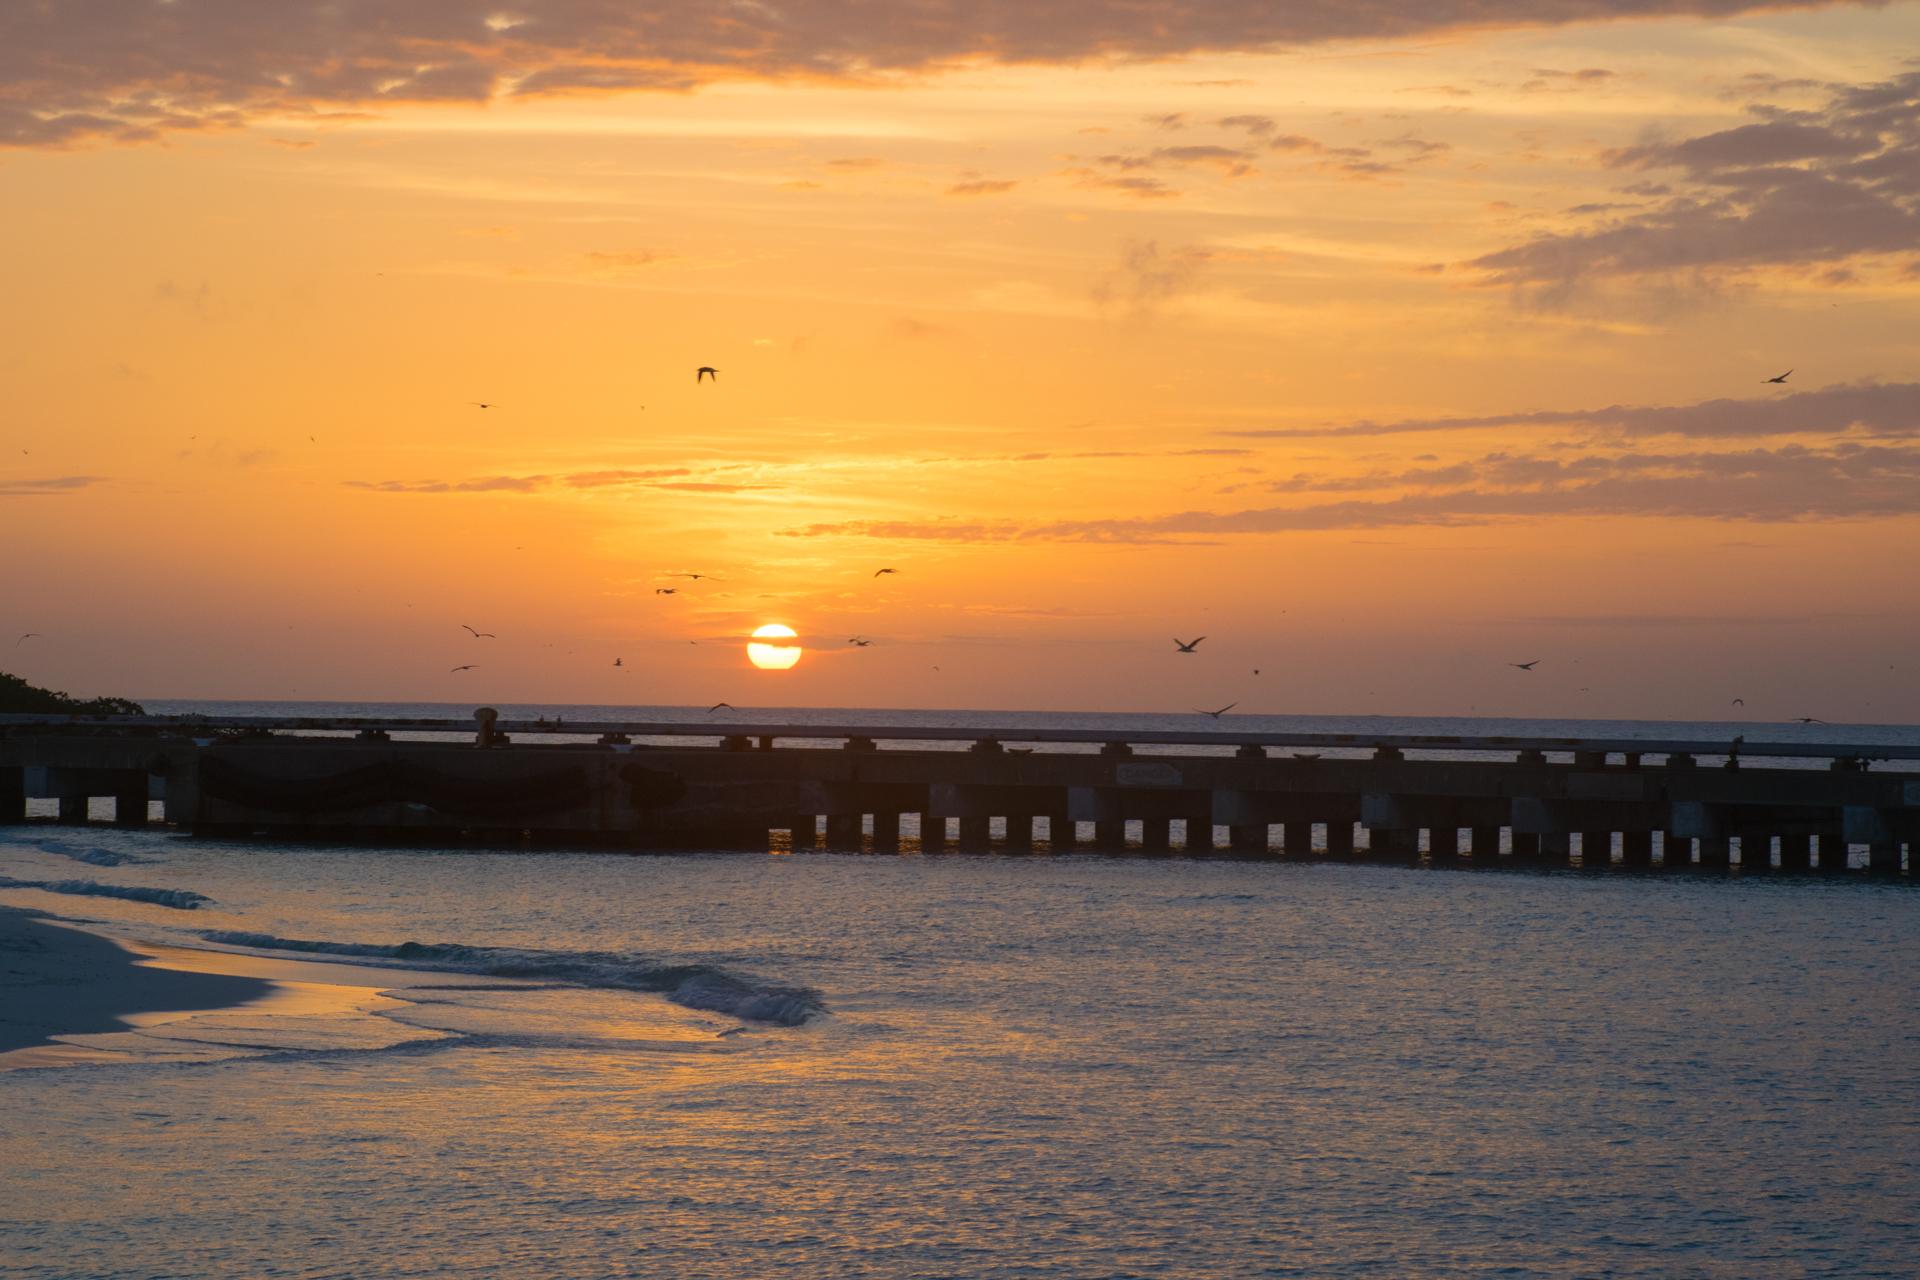 Midway, Atoll, Sunset